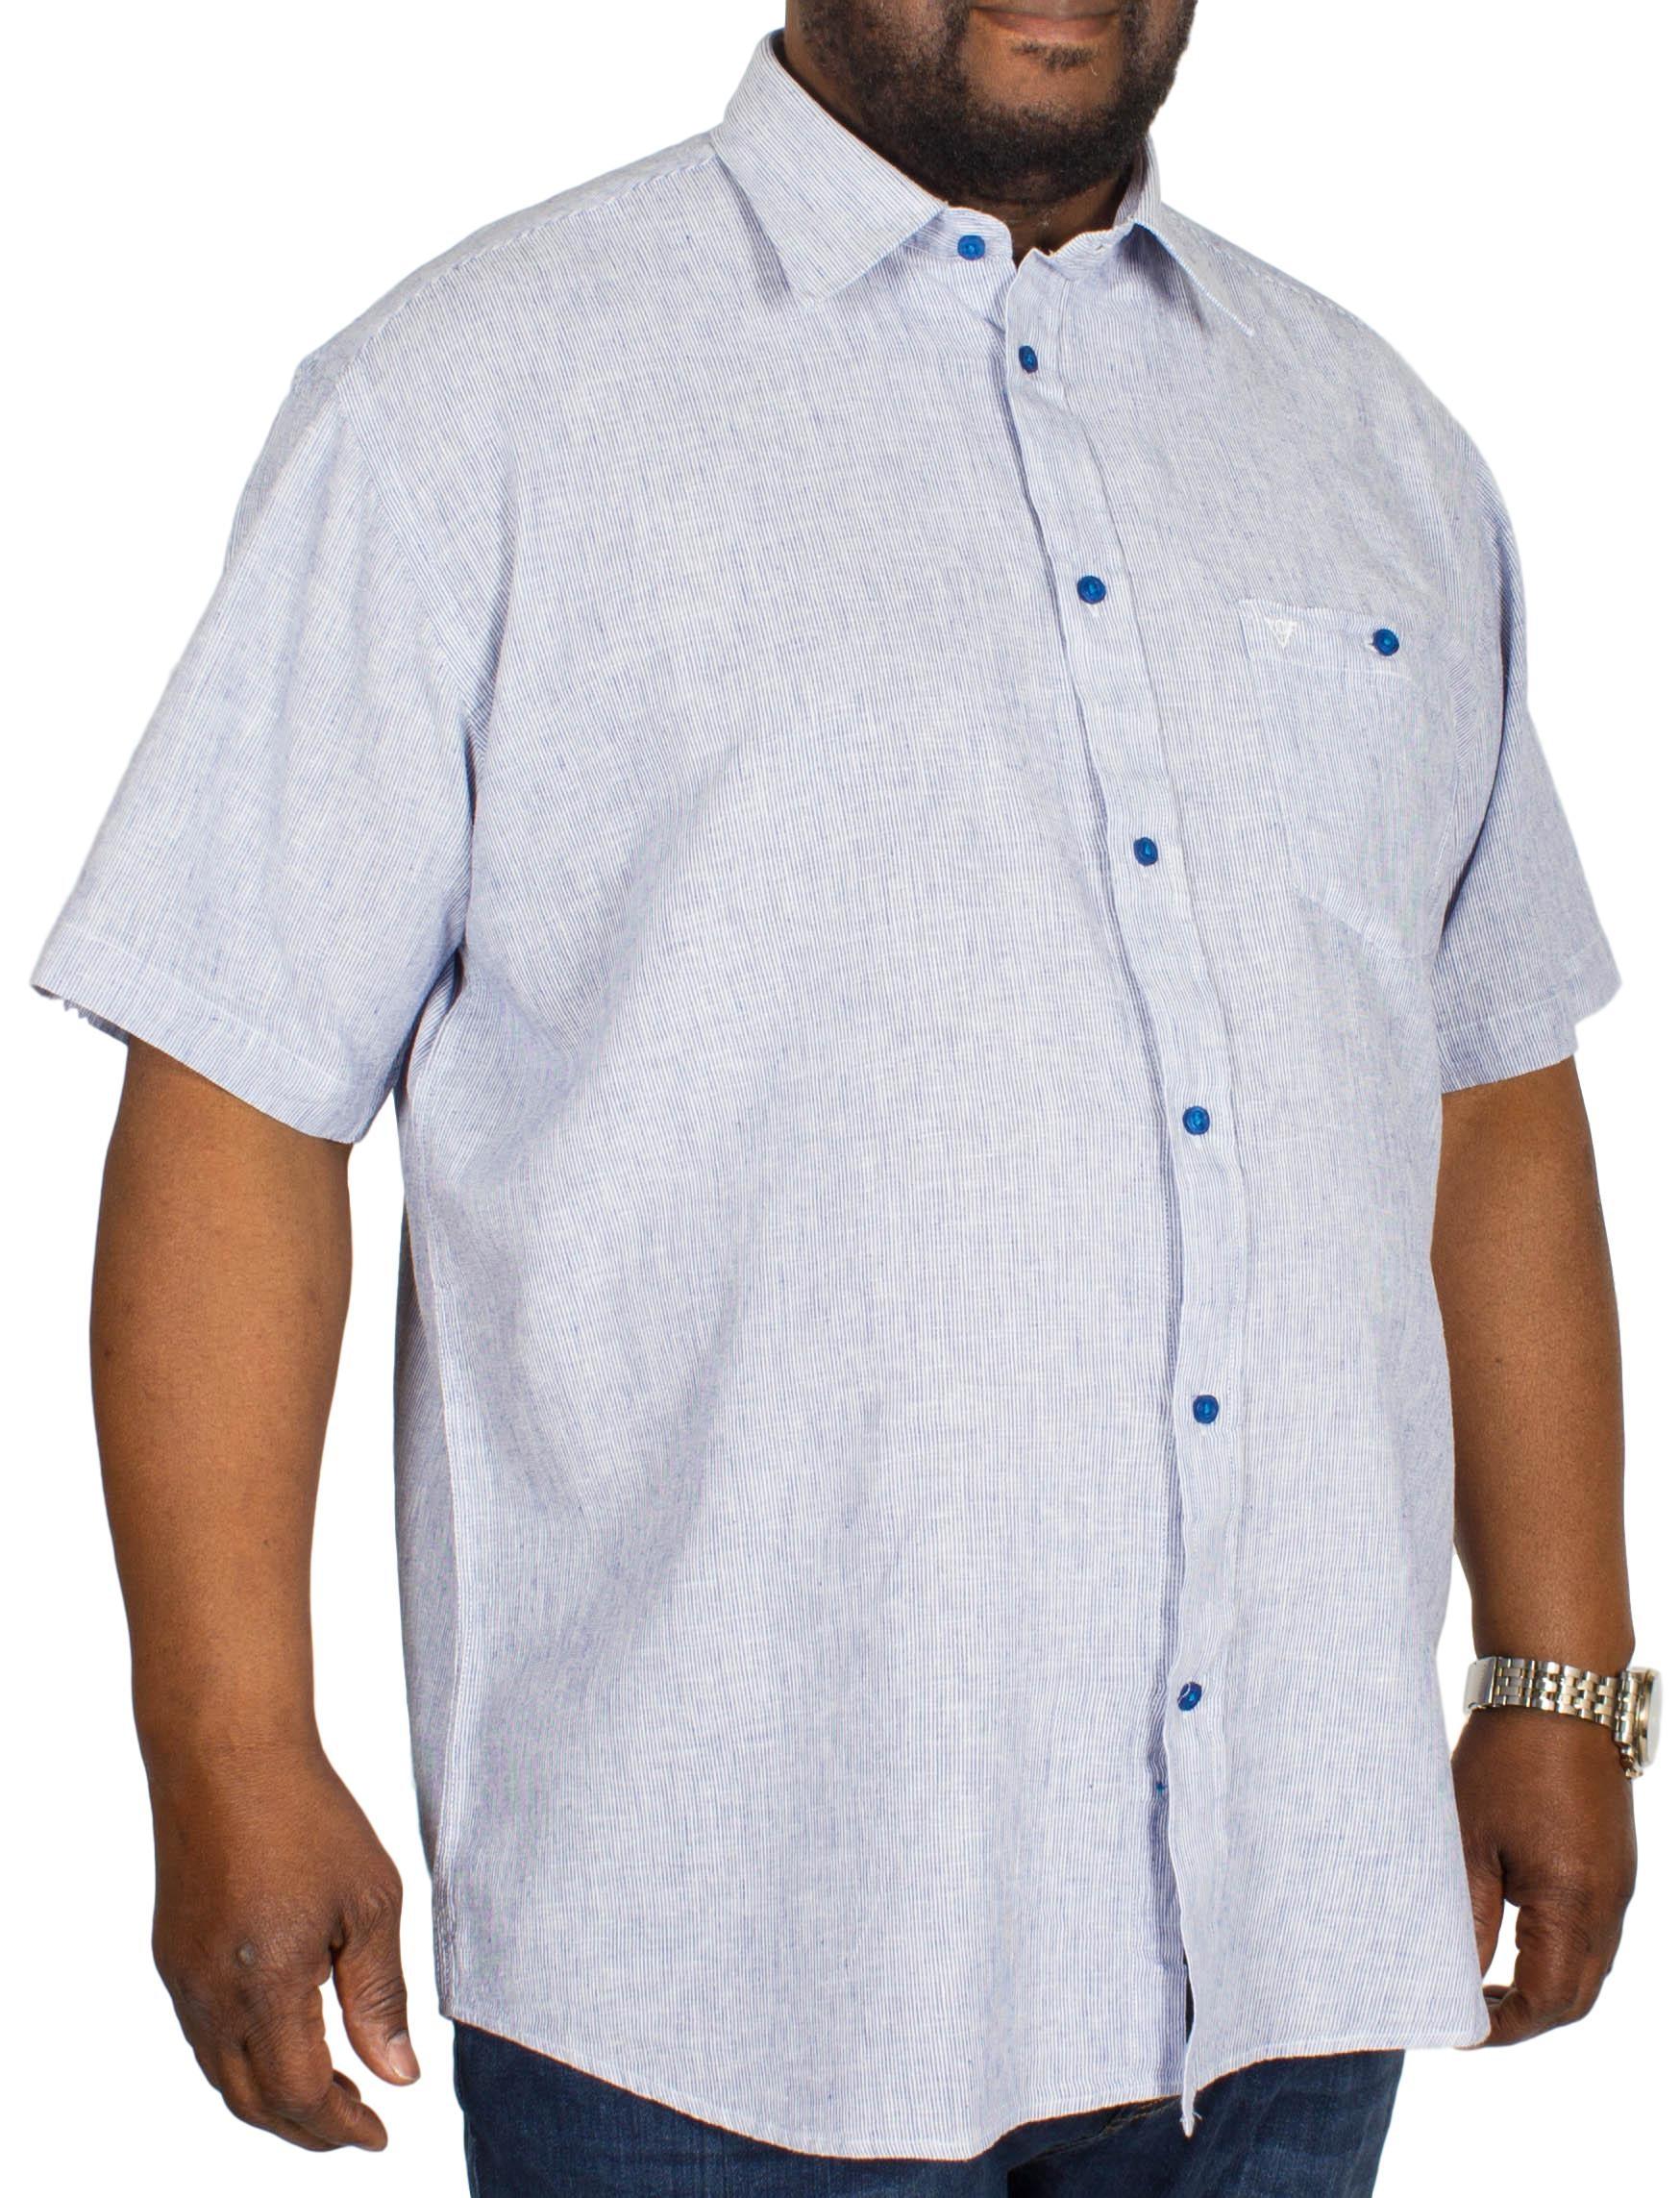 Cotton Valley Linen Mix Stripe Shirt Navy/White